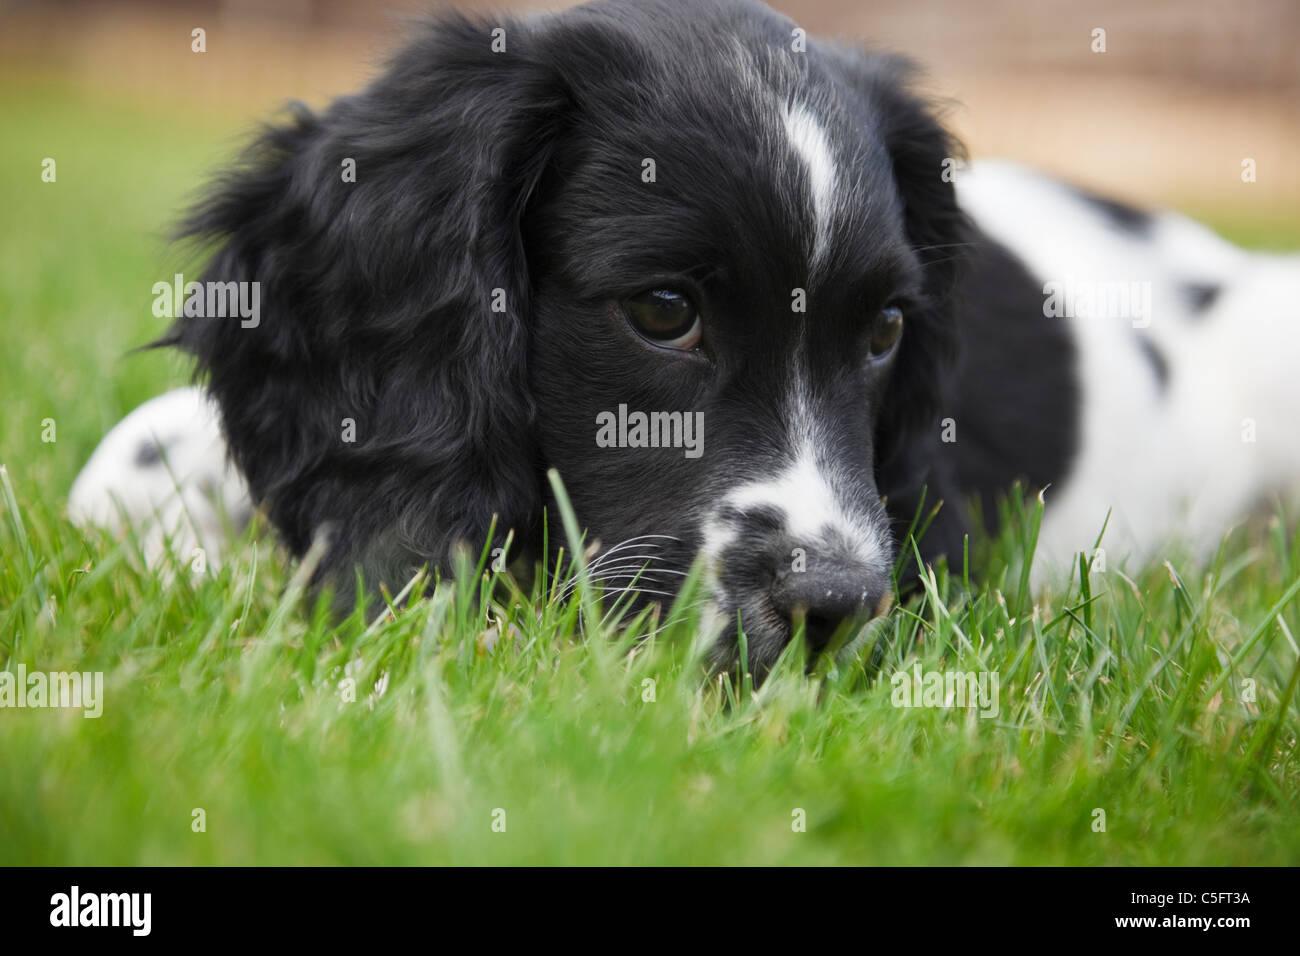 Spaniel Puppy Stock Photos & Spaniel Puppy Stock Images - Alamy